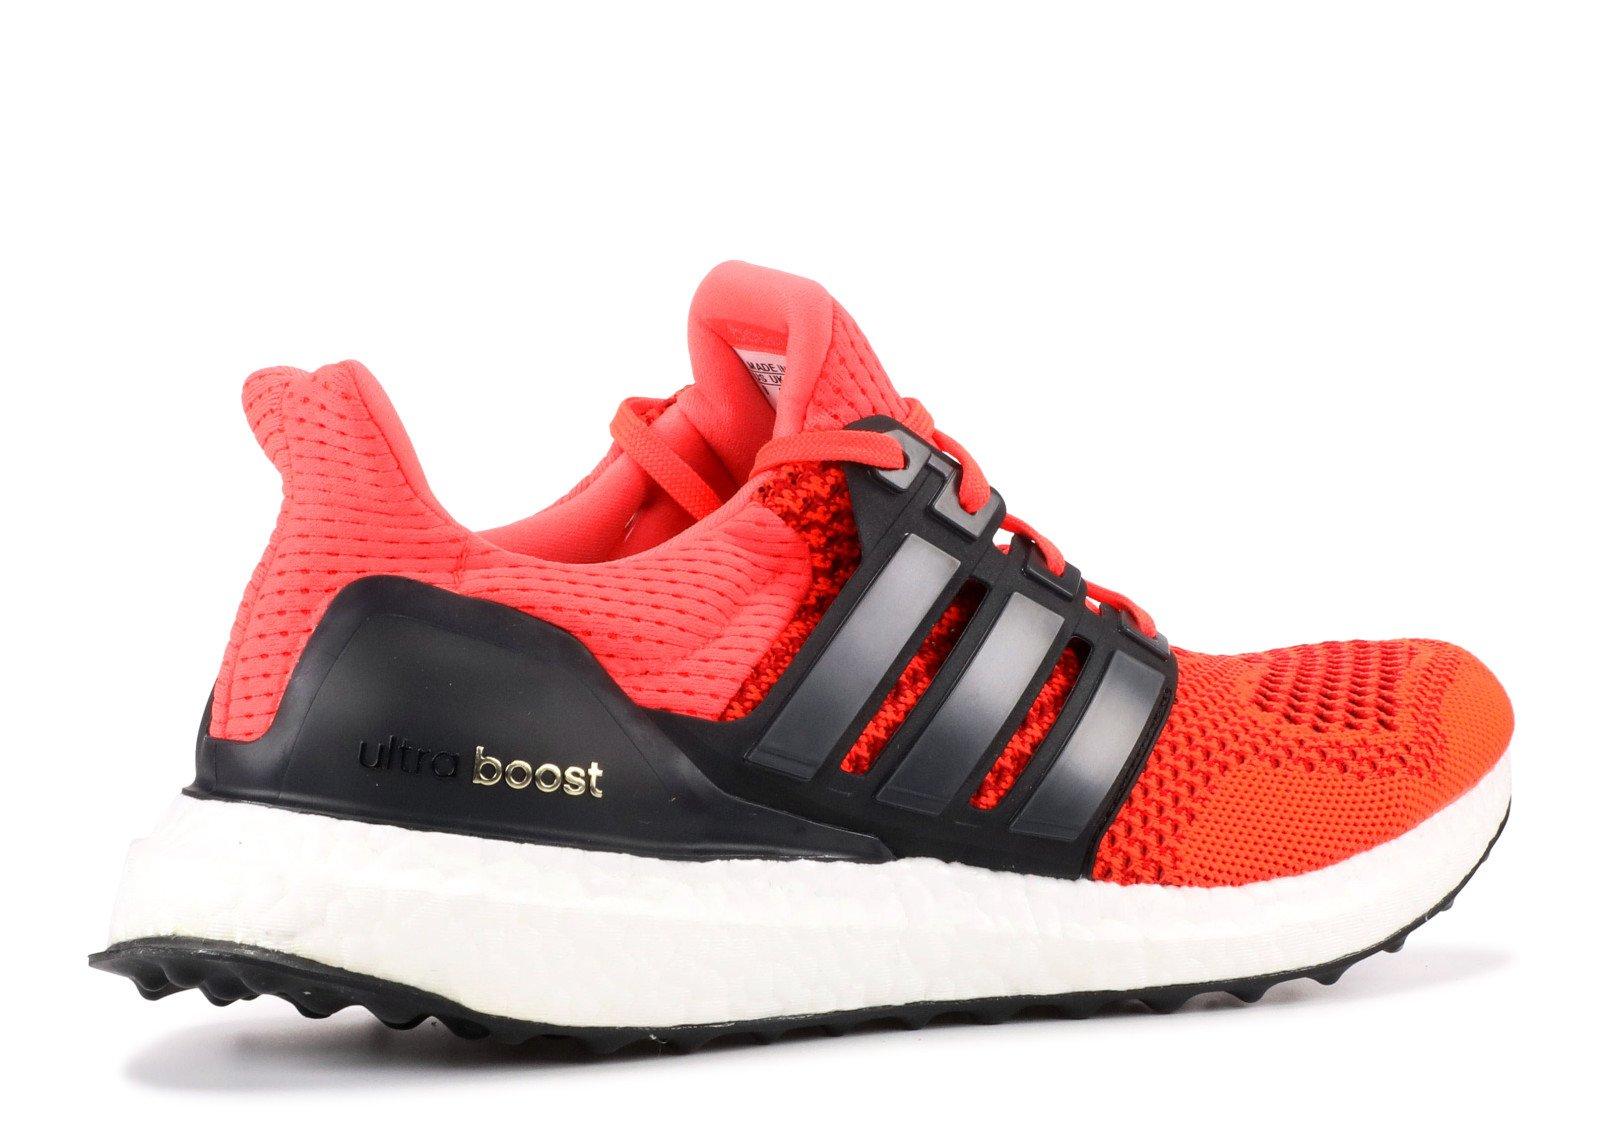 71op eulYuL - adidas Men's Ultra Boost M Running Shoes